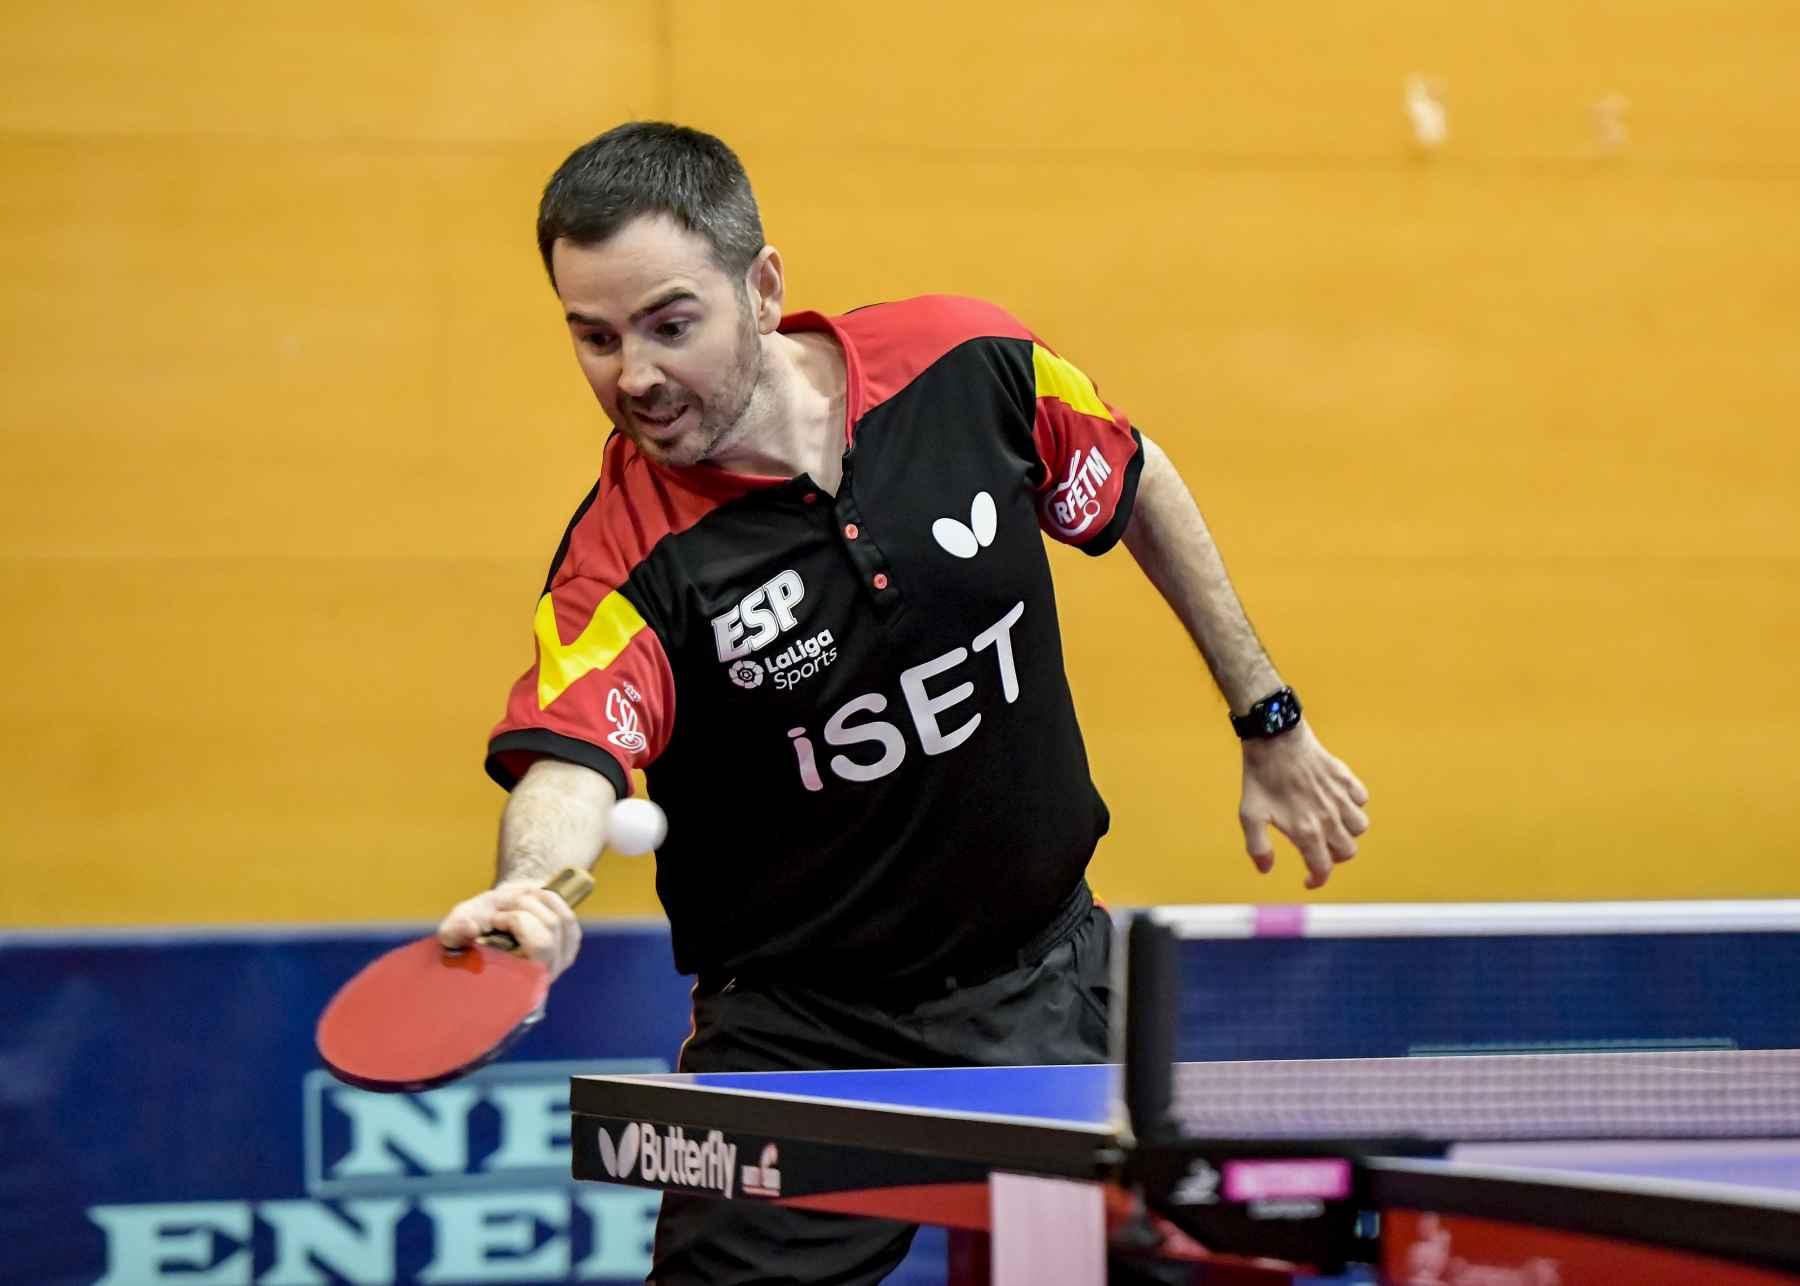 Álvaro Valera disputando el PTT Spanish Open 2020